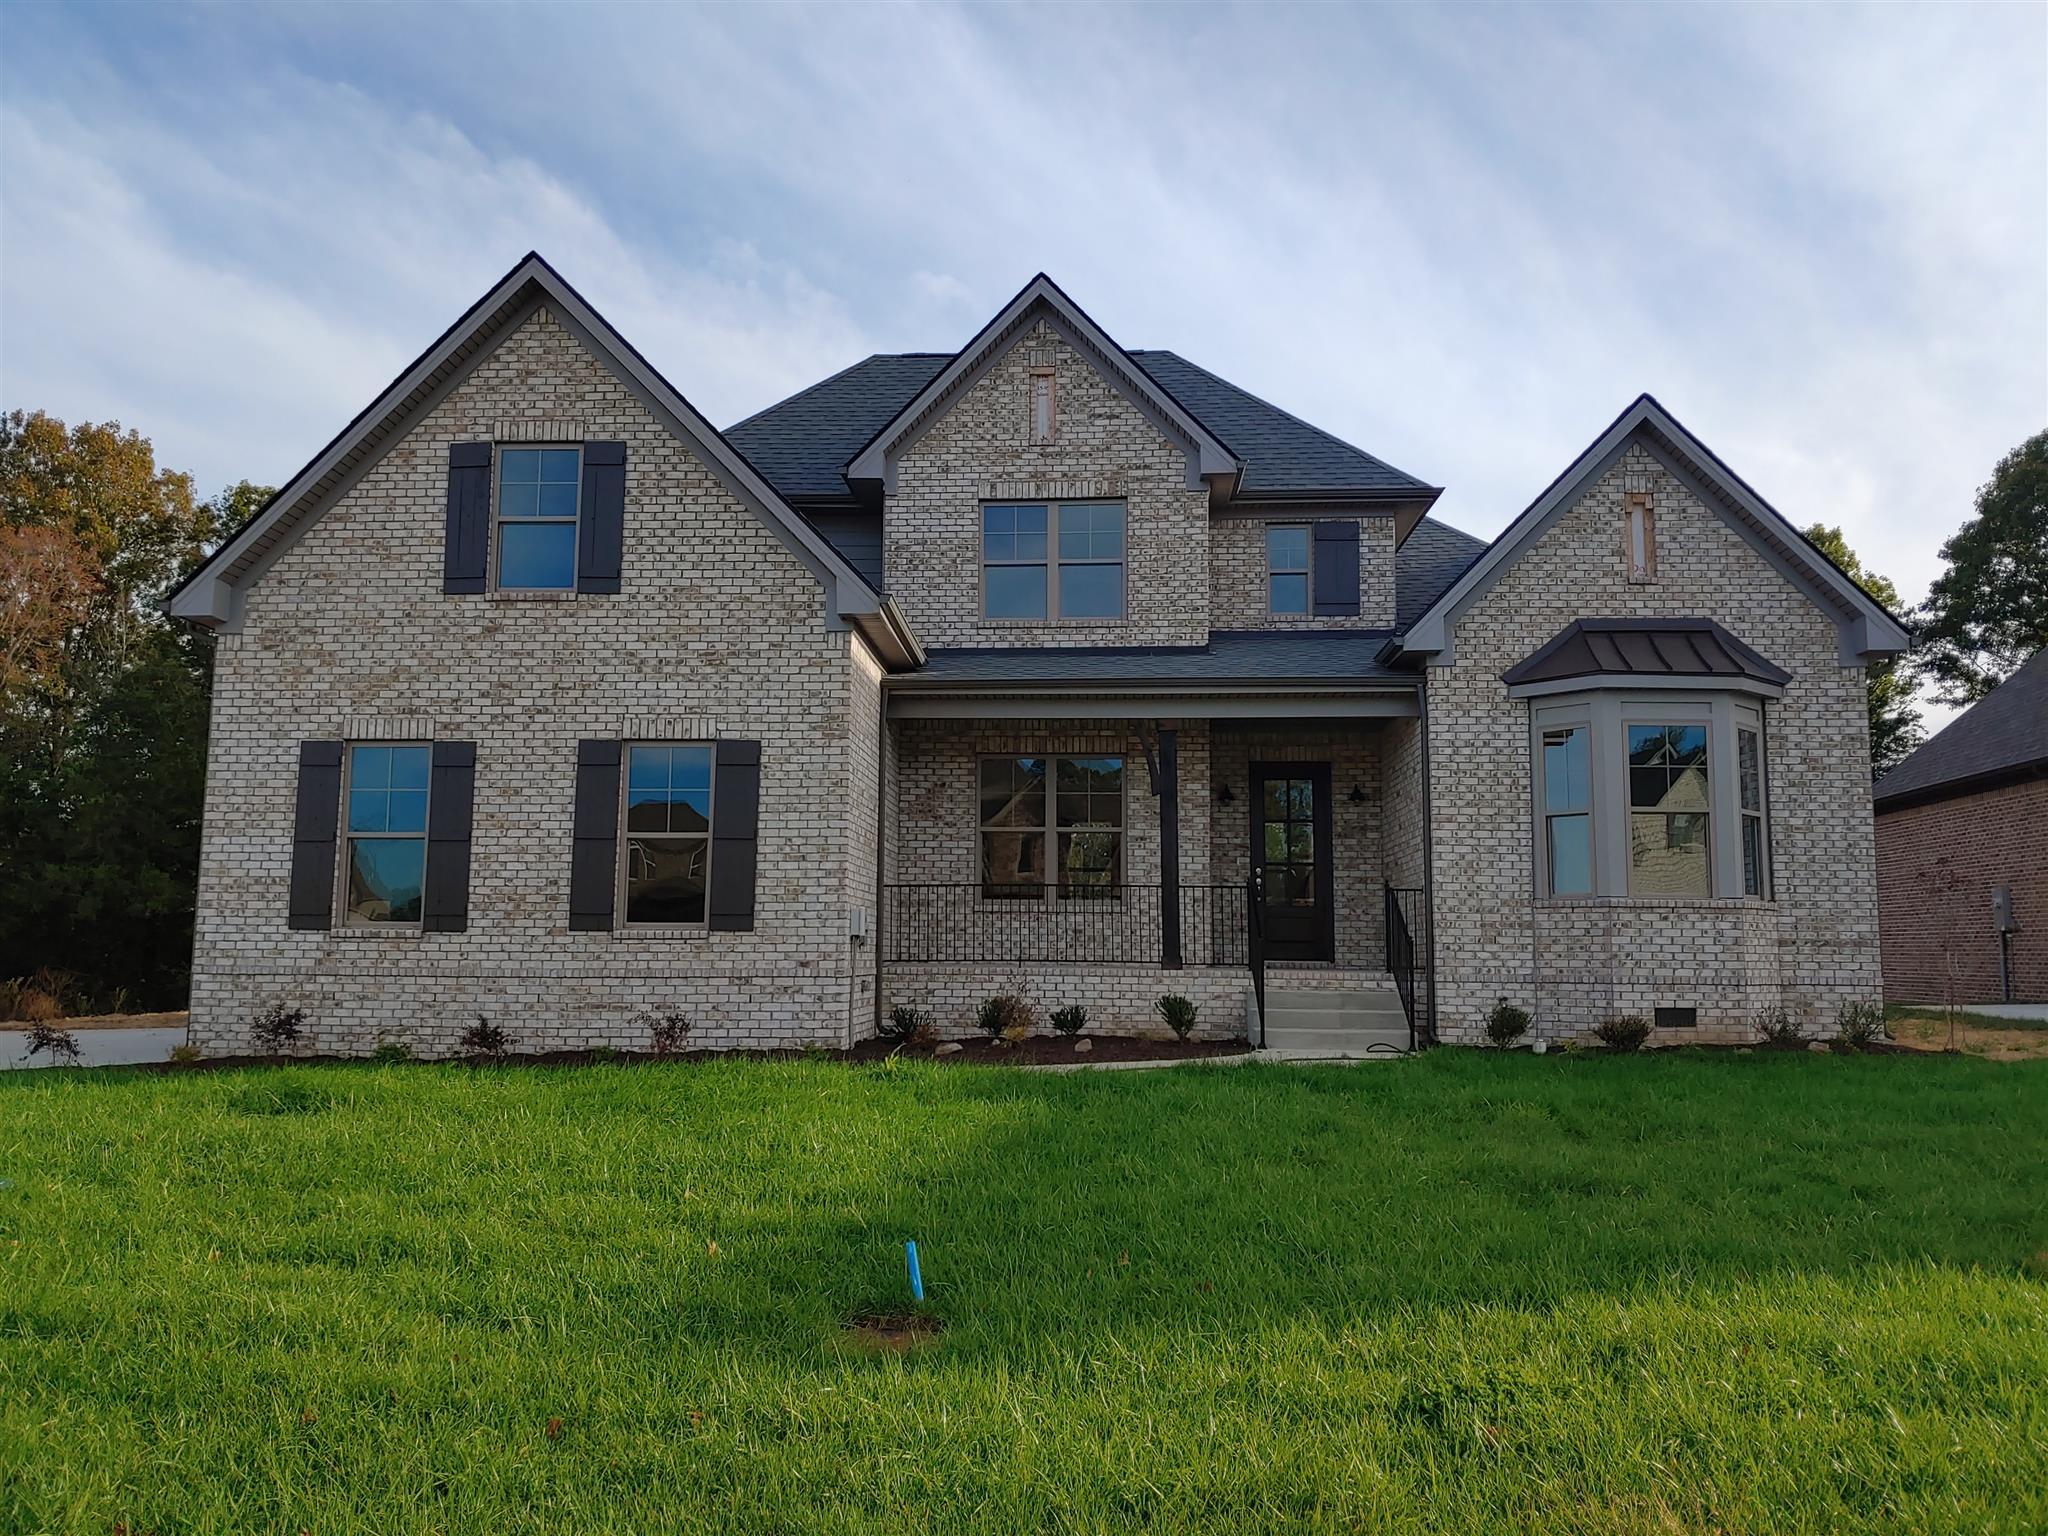 7027 Springwater St - Lot 9, Smyrna, TN 37167 - Smyrna, TN real estate listing